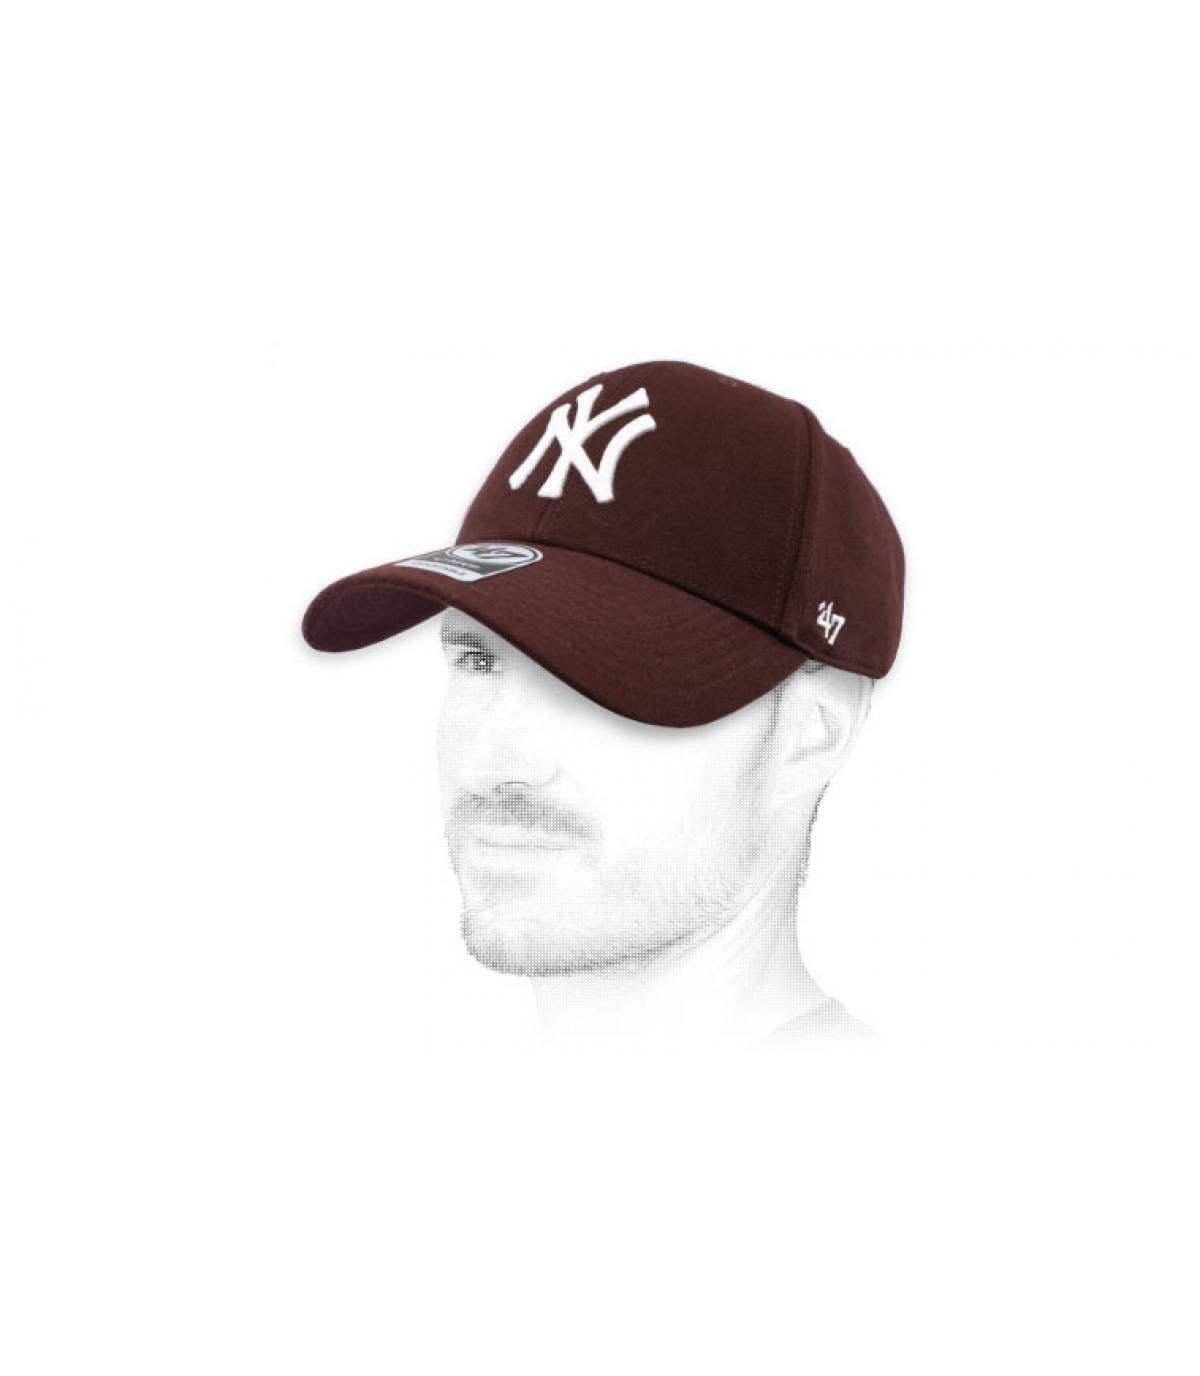 burgundy NY cap47